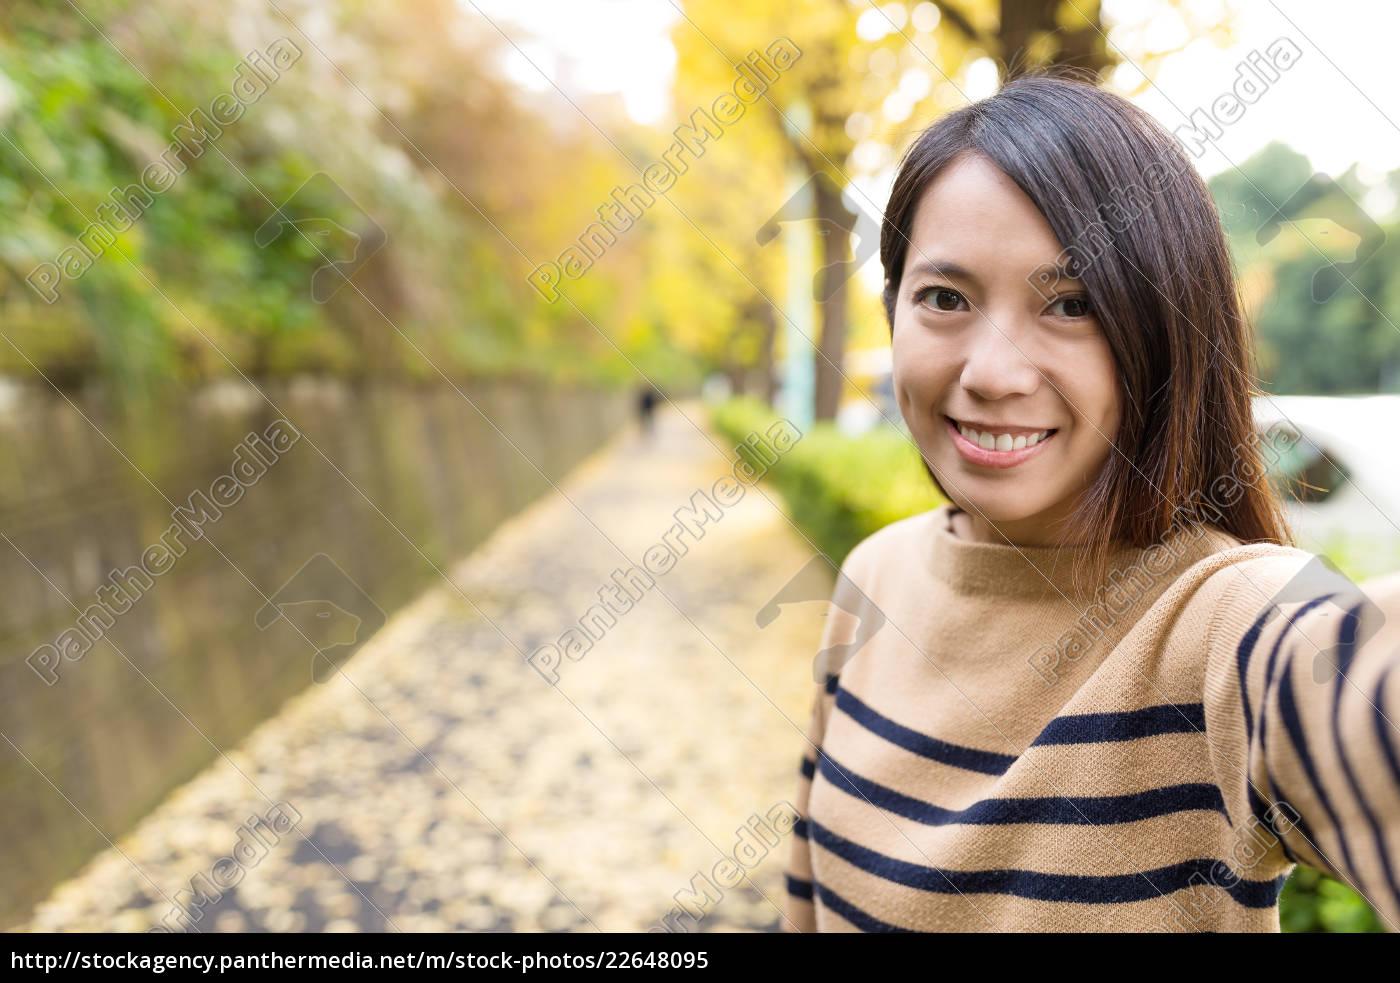 woman, taking, selfie, in, the, road - 22648095